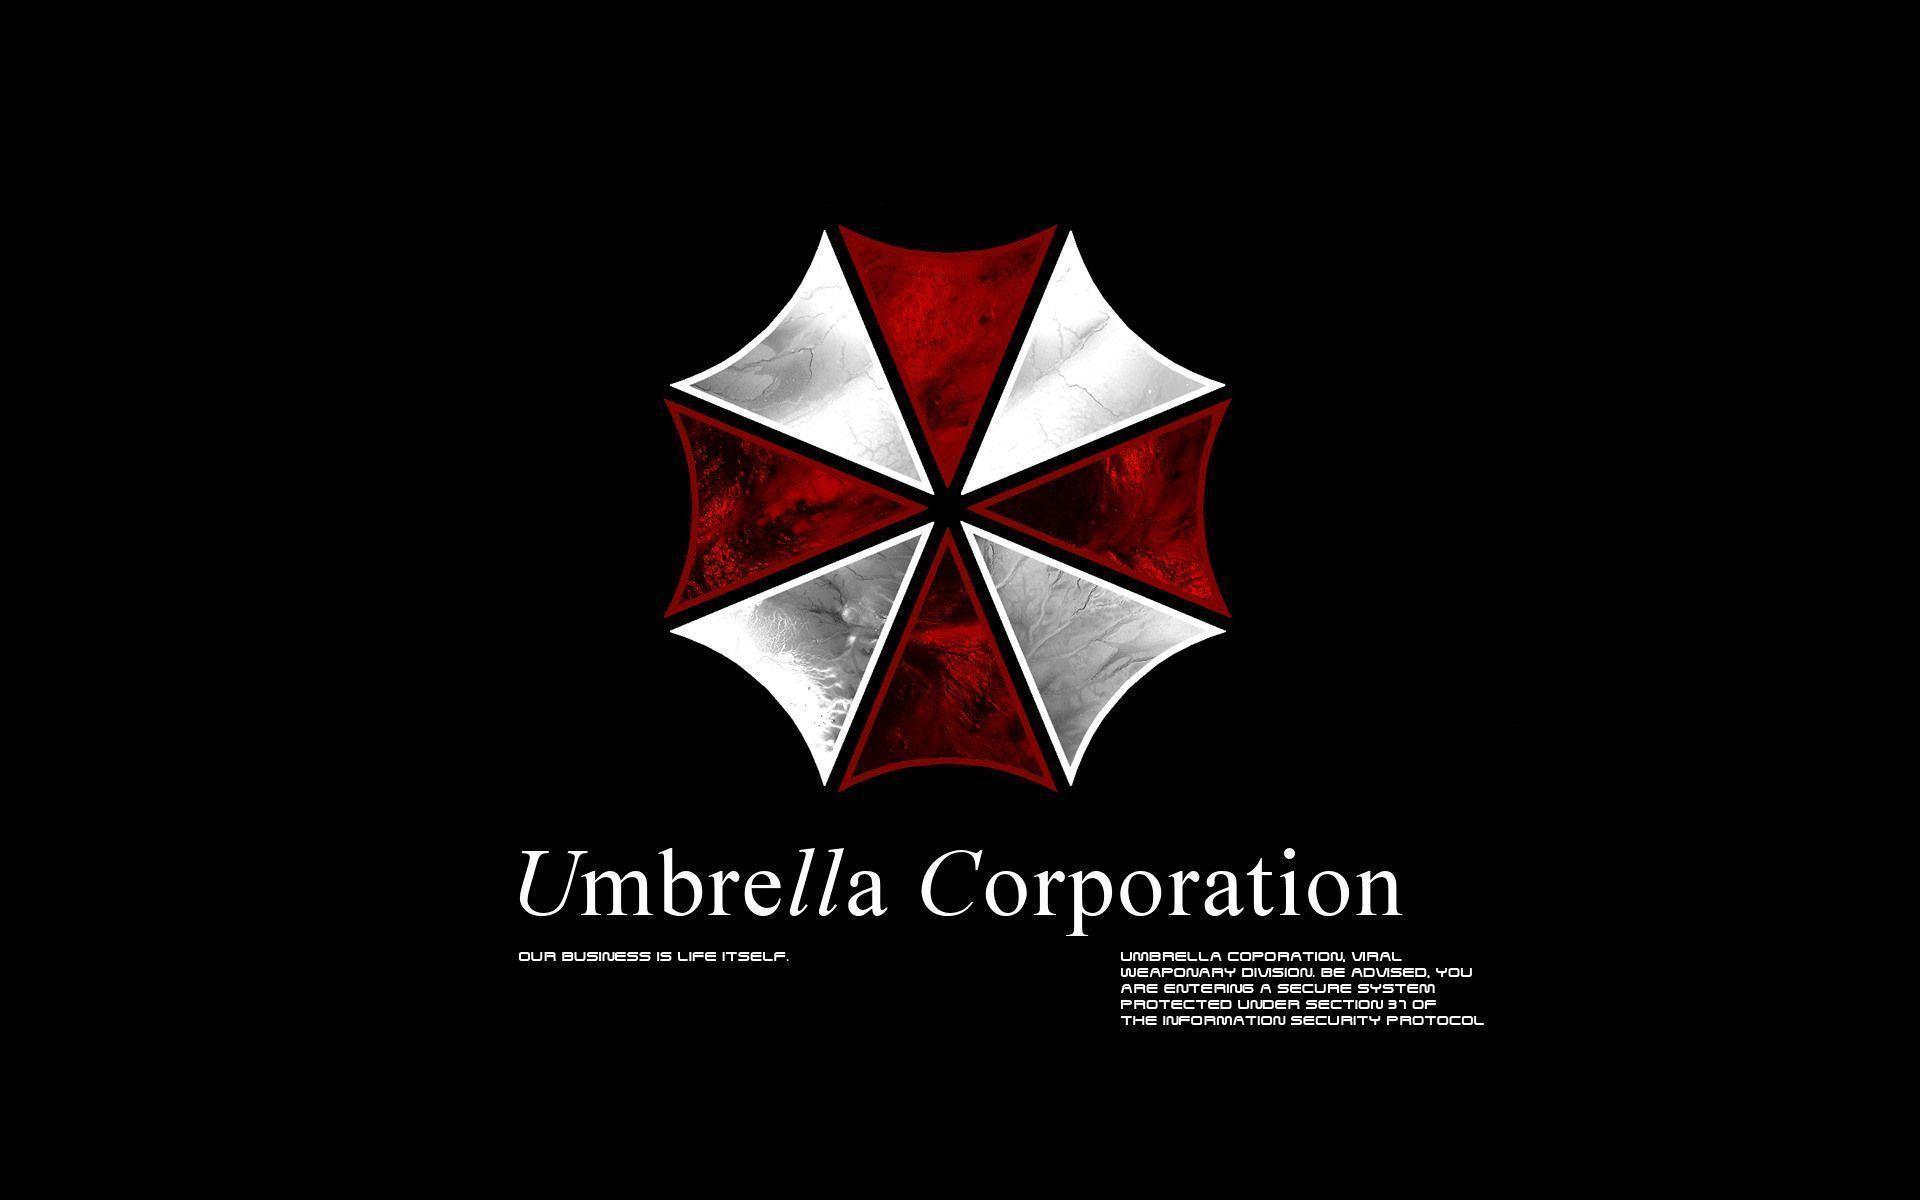 umbrella corporation wallpapers full hd wallpaper search